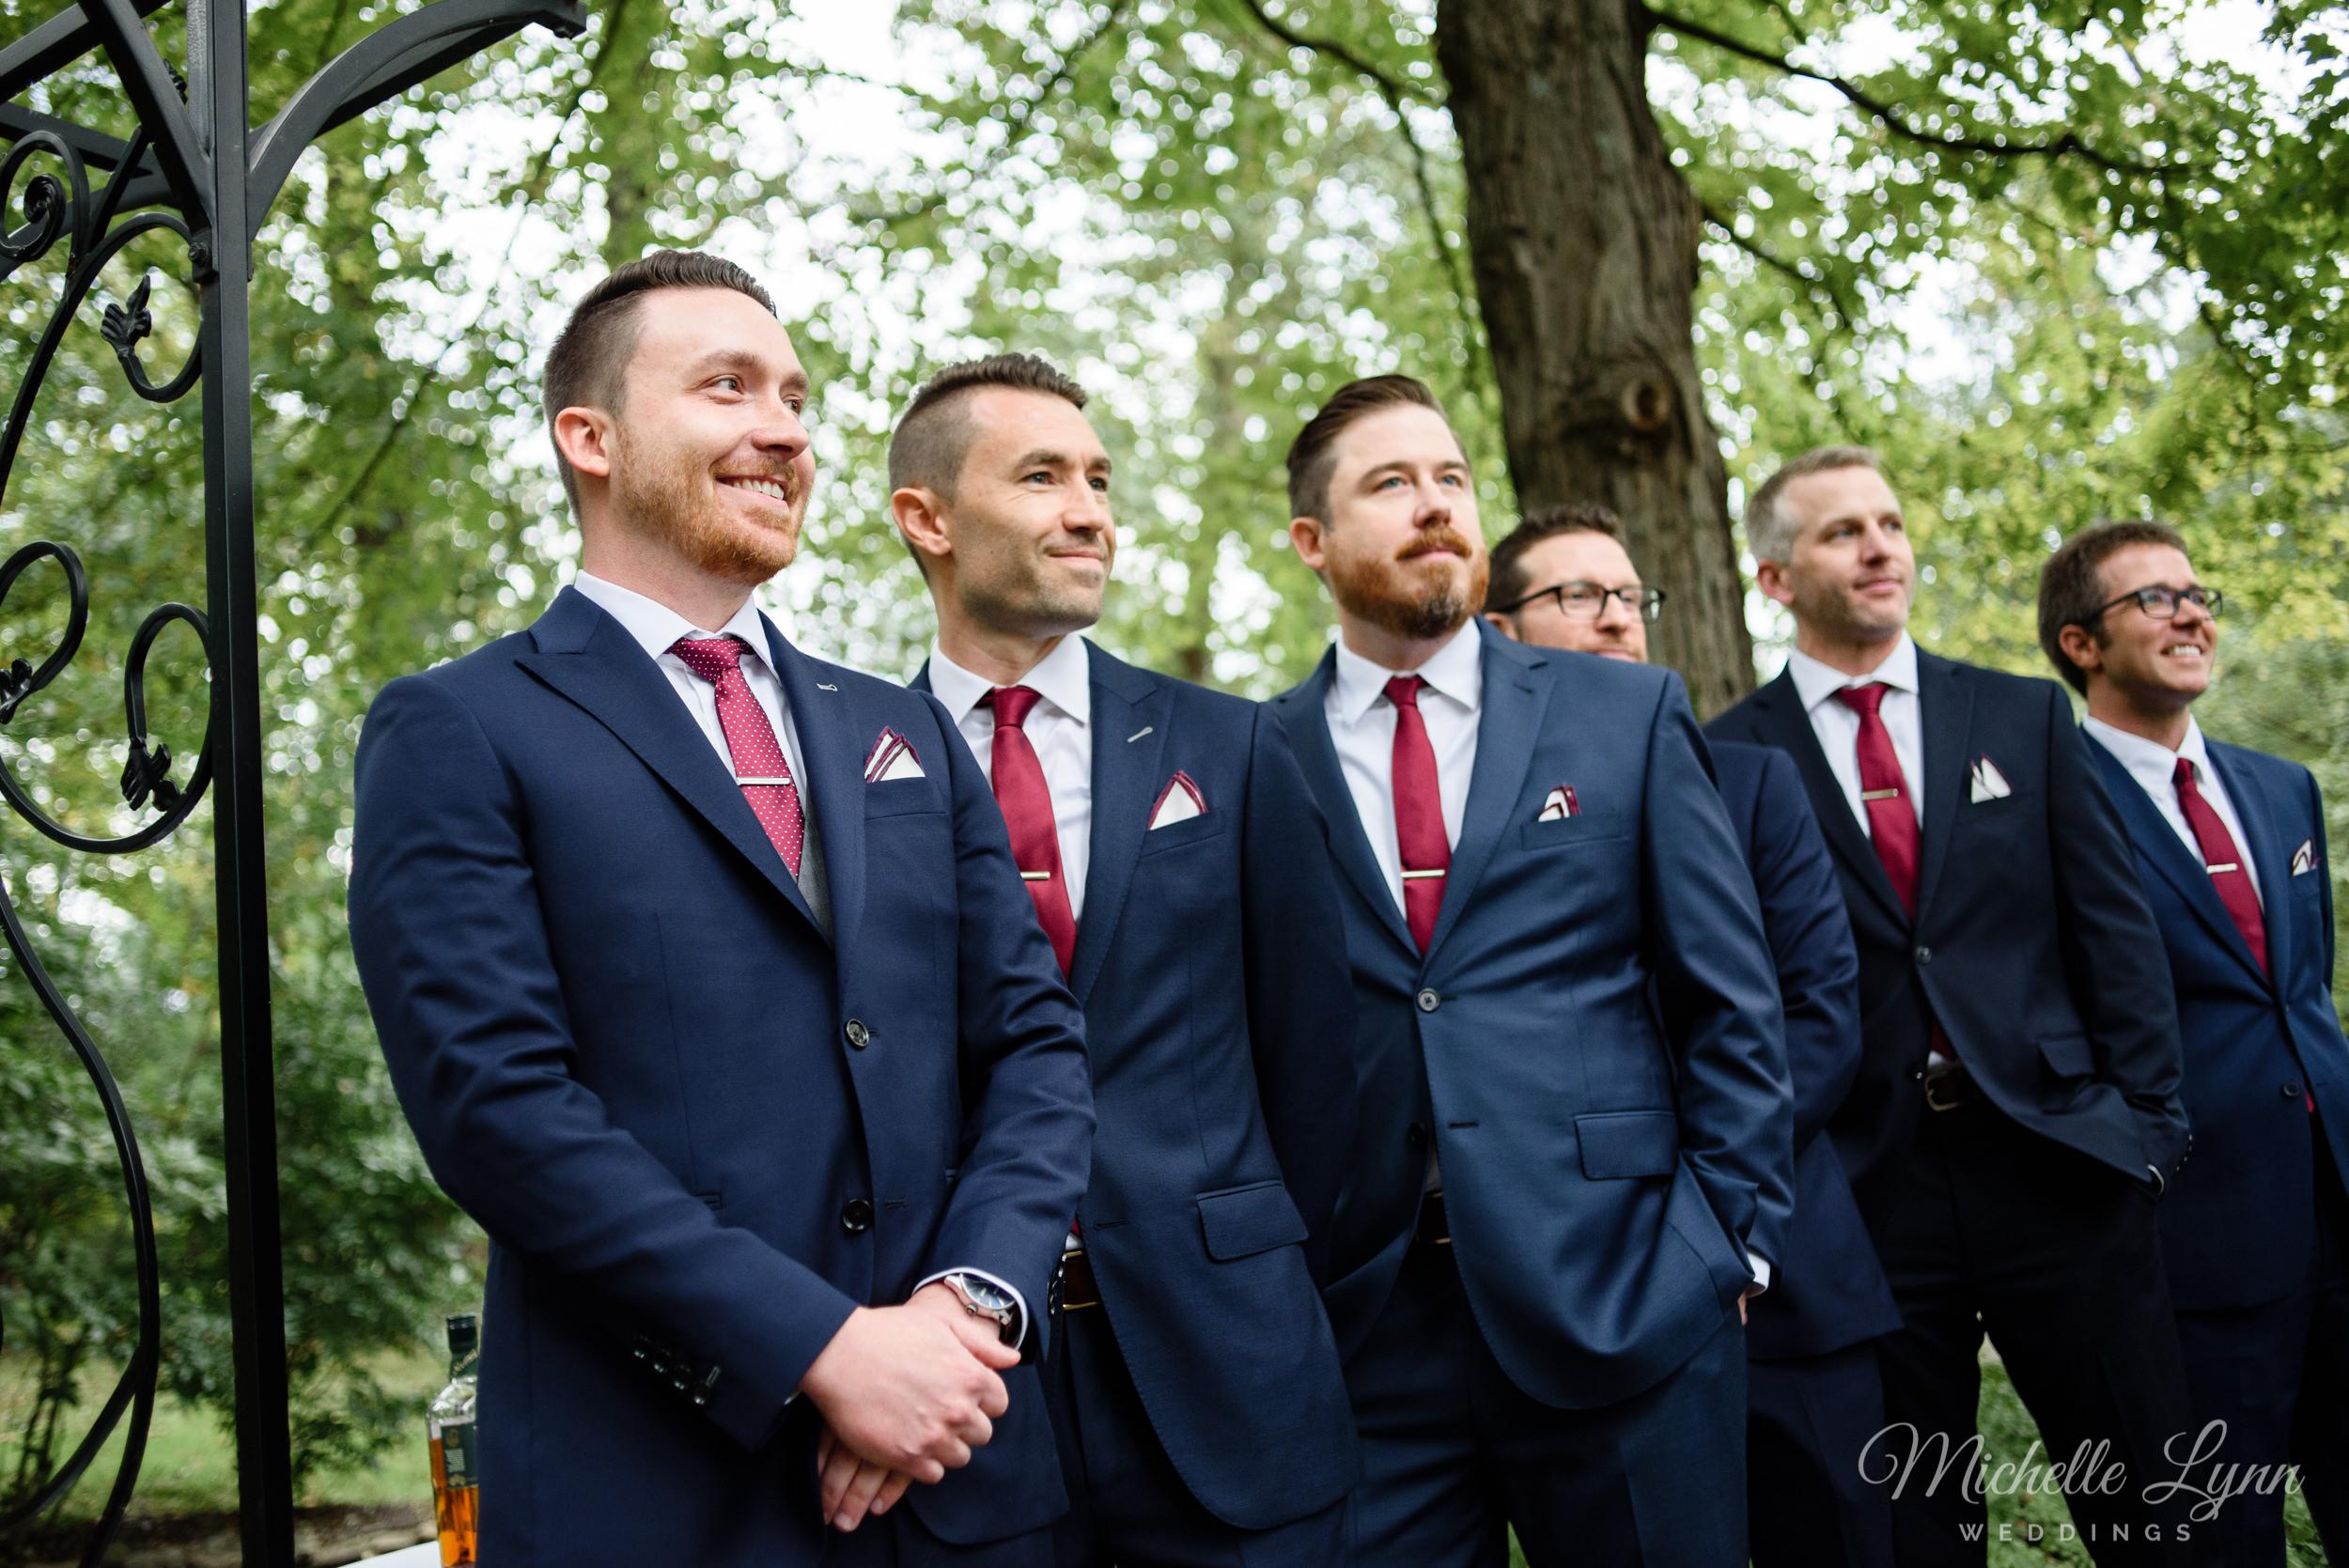 mlw-lumberville-general-store-new-hope-wedding-photographer-34.jpg